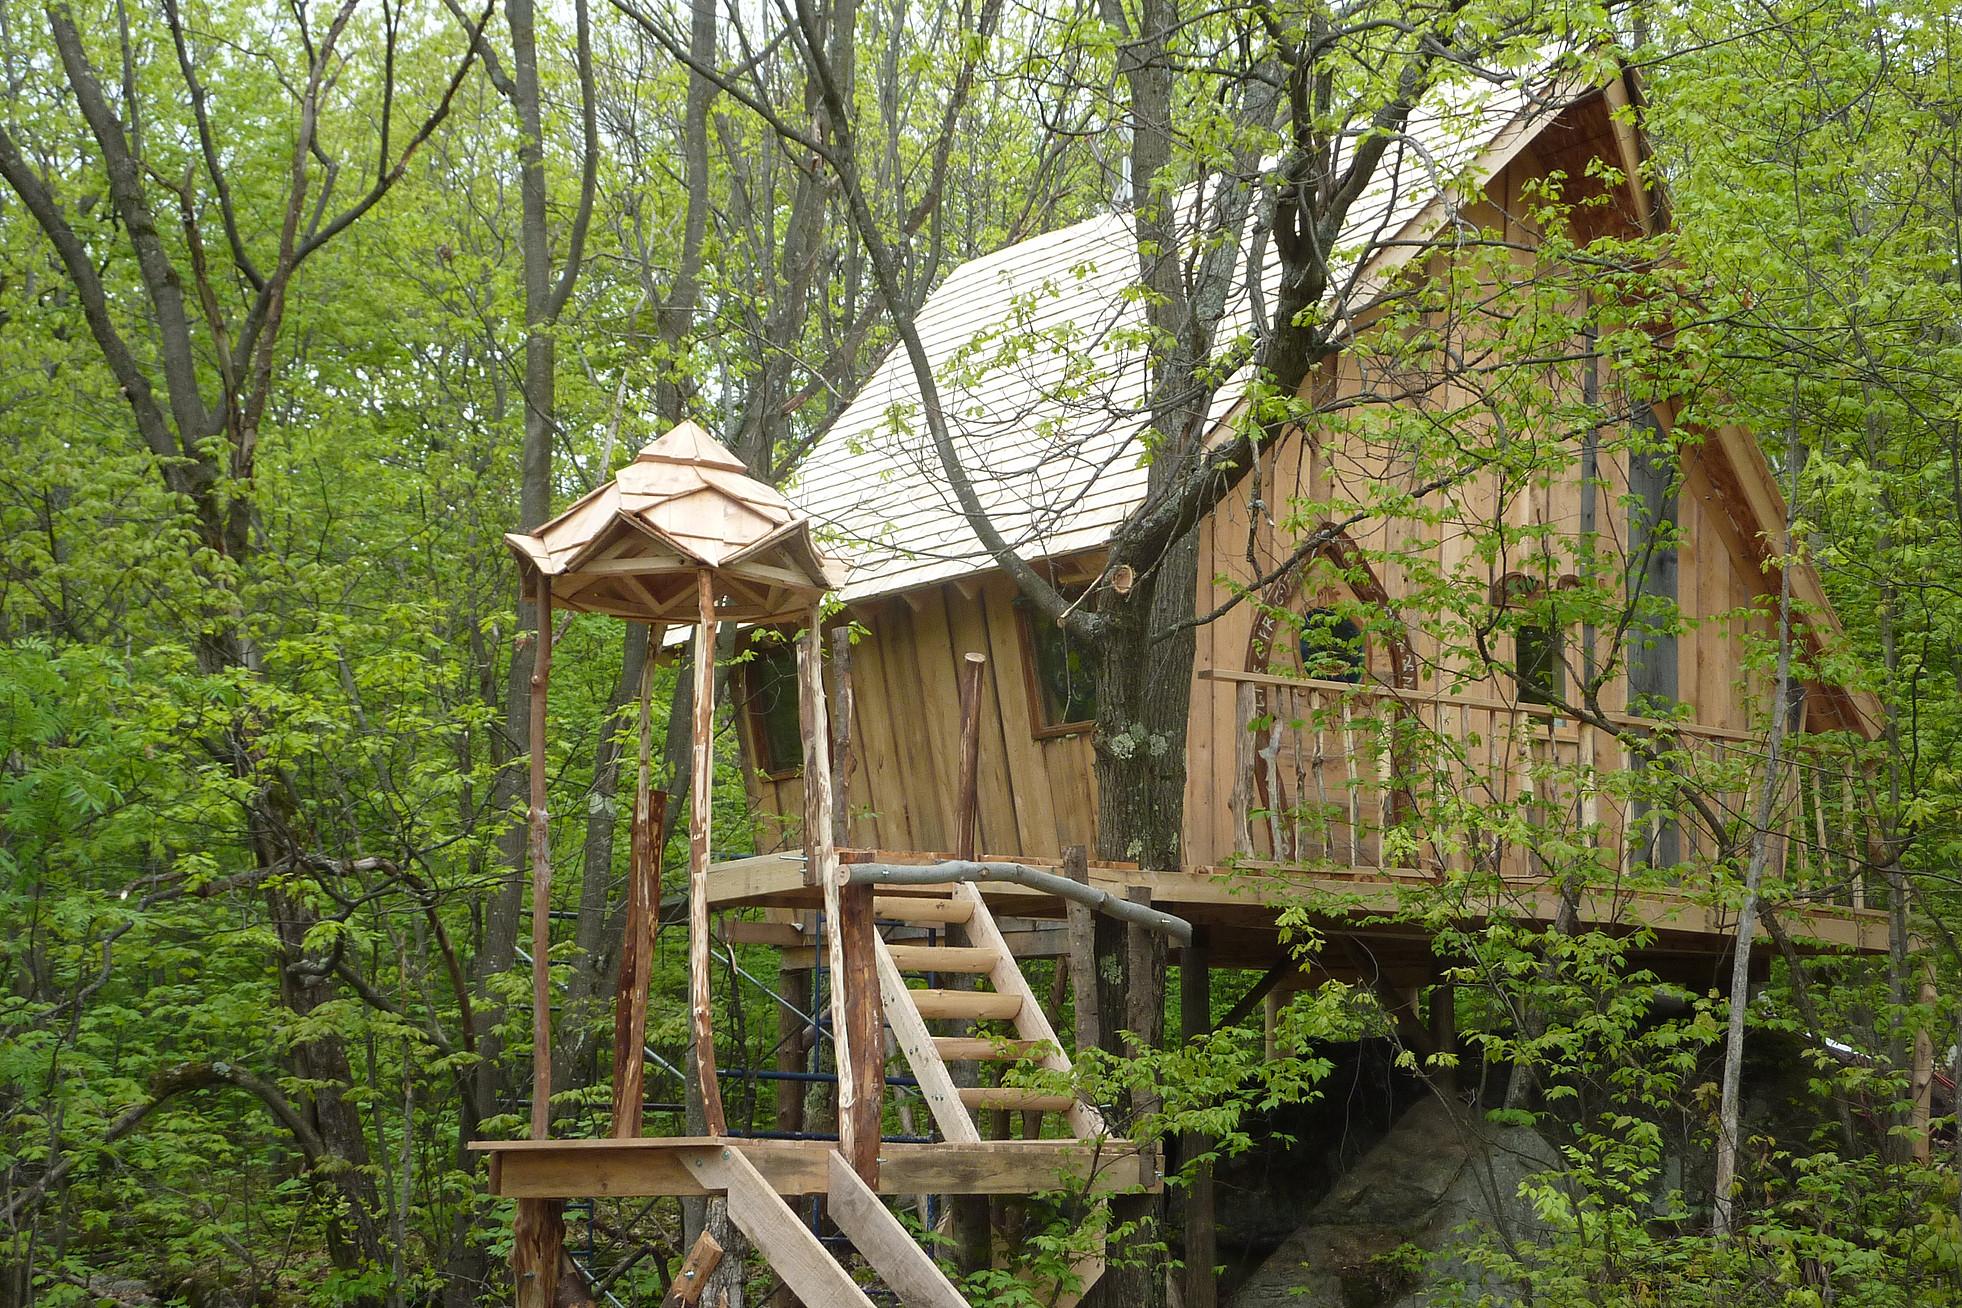 la-maison-elfe-hobbit-feerie-habitats-insolite-0